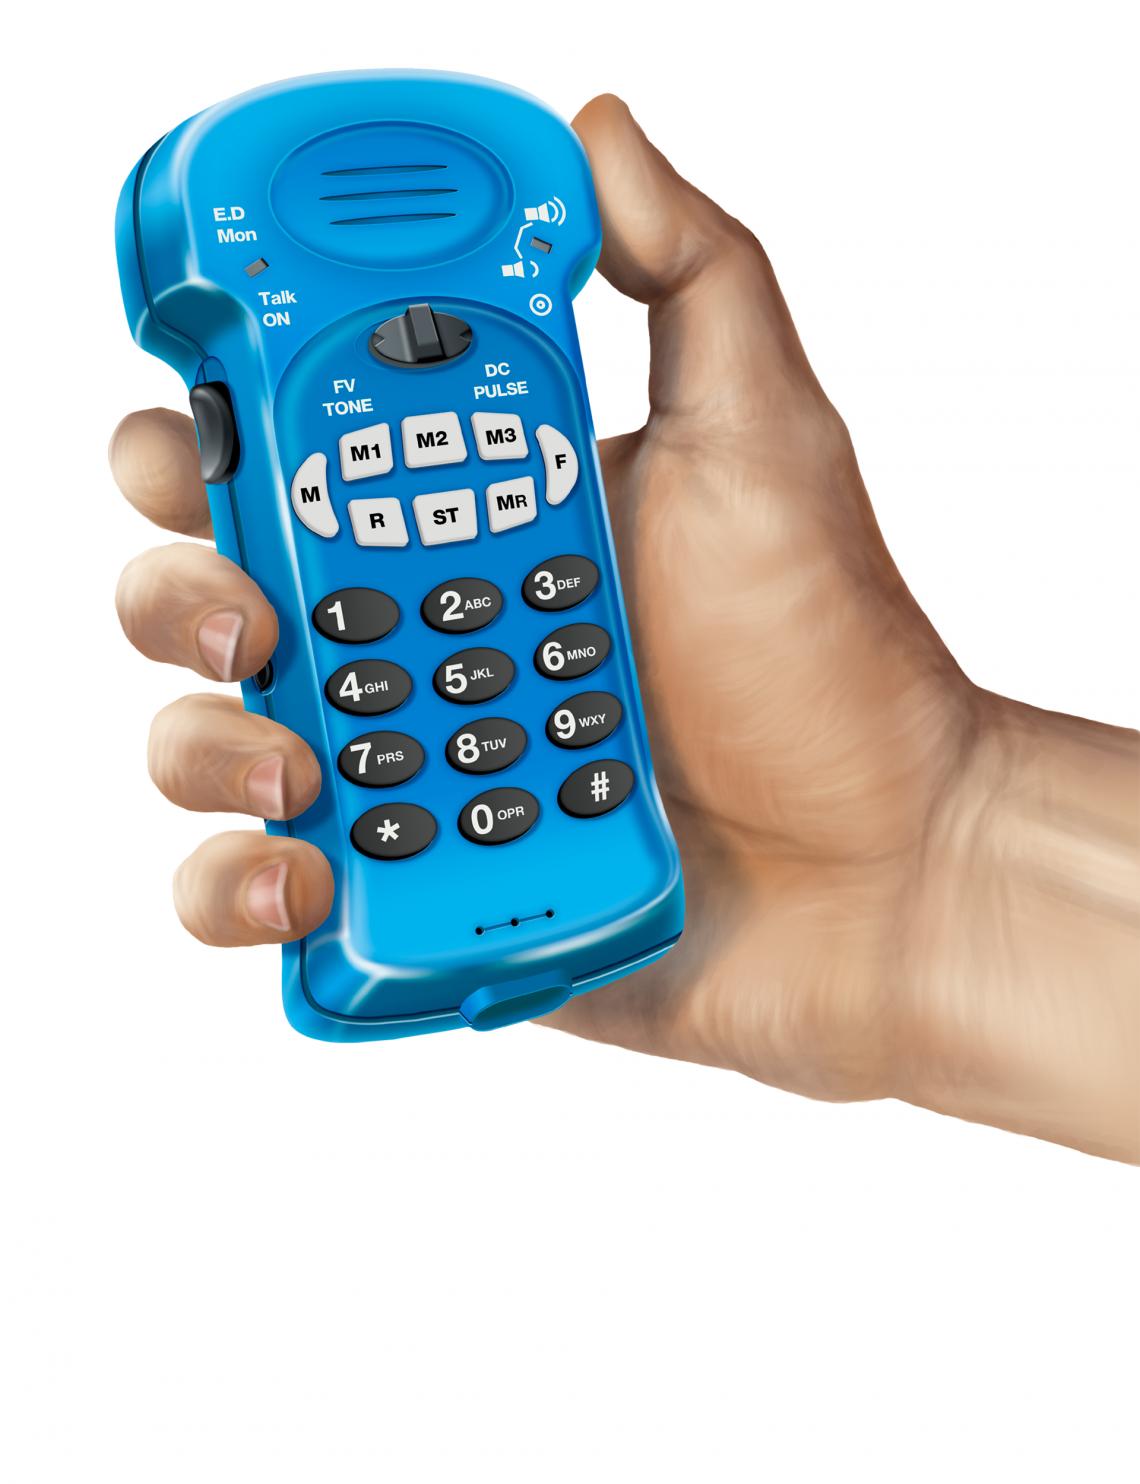 Telecommunications Test Equipment – realistic image